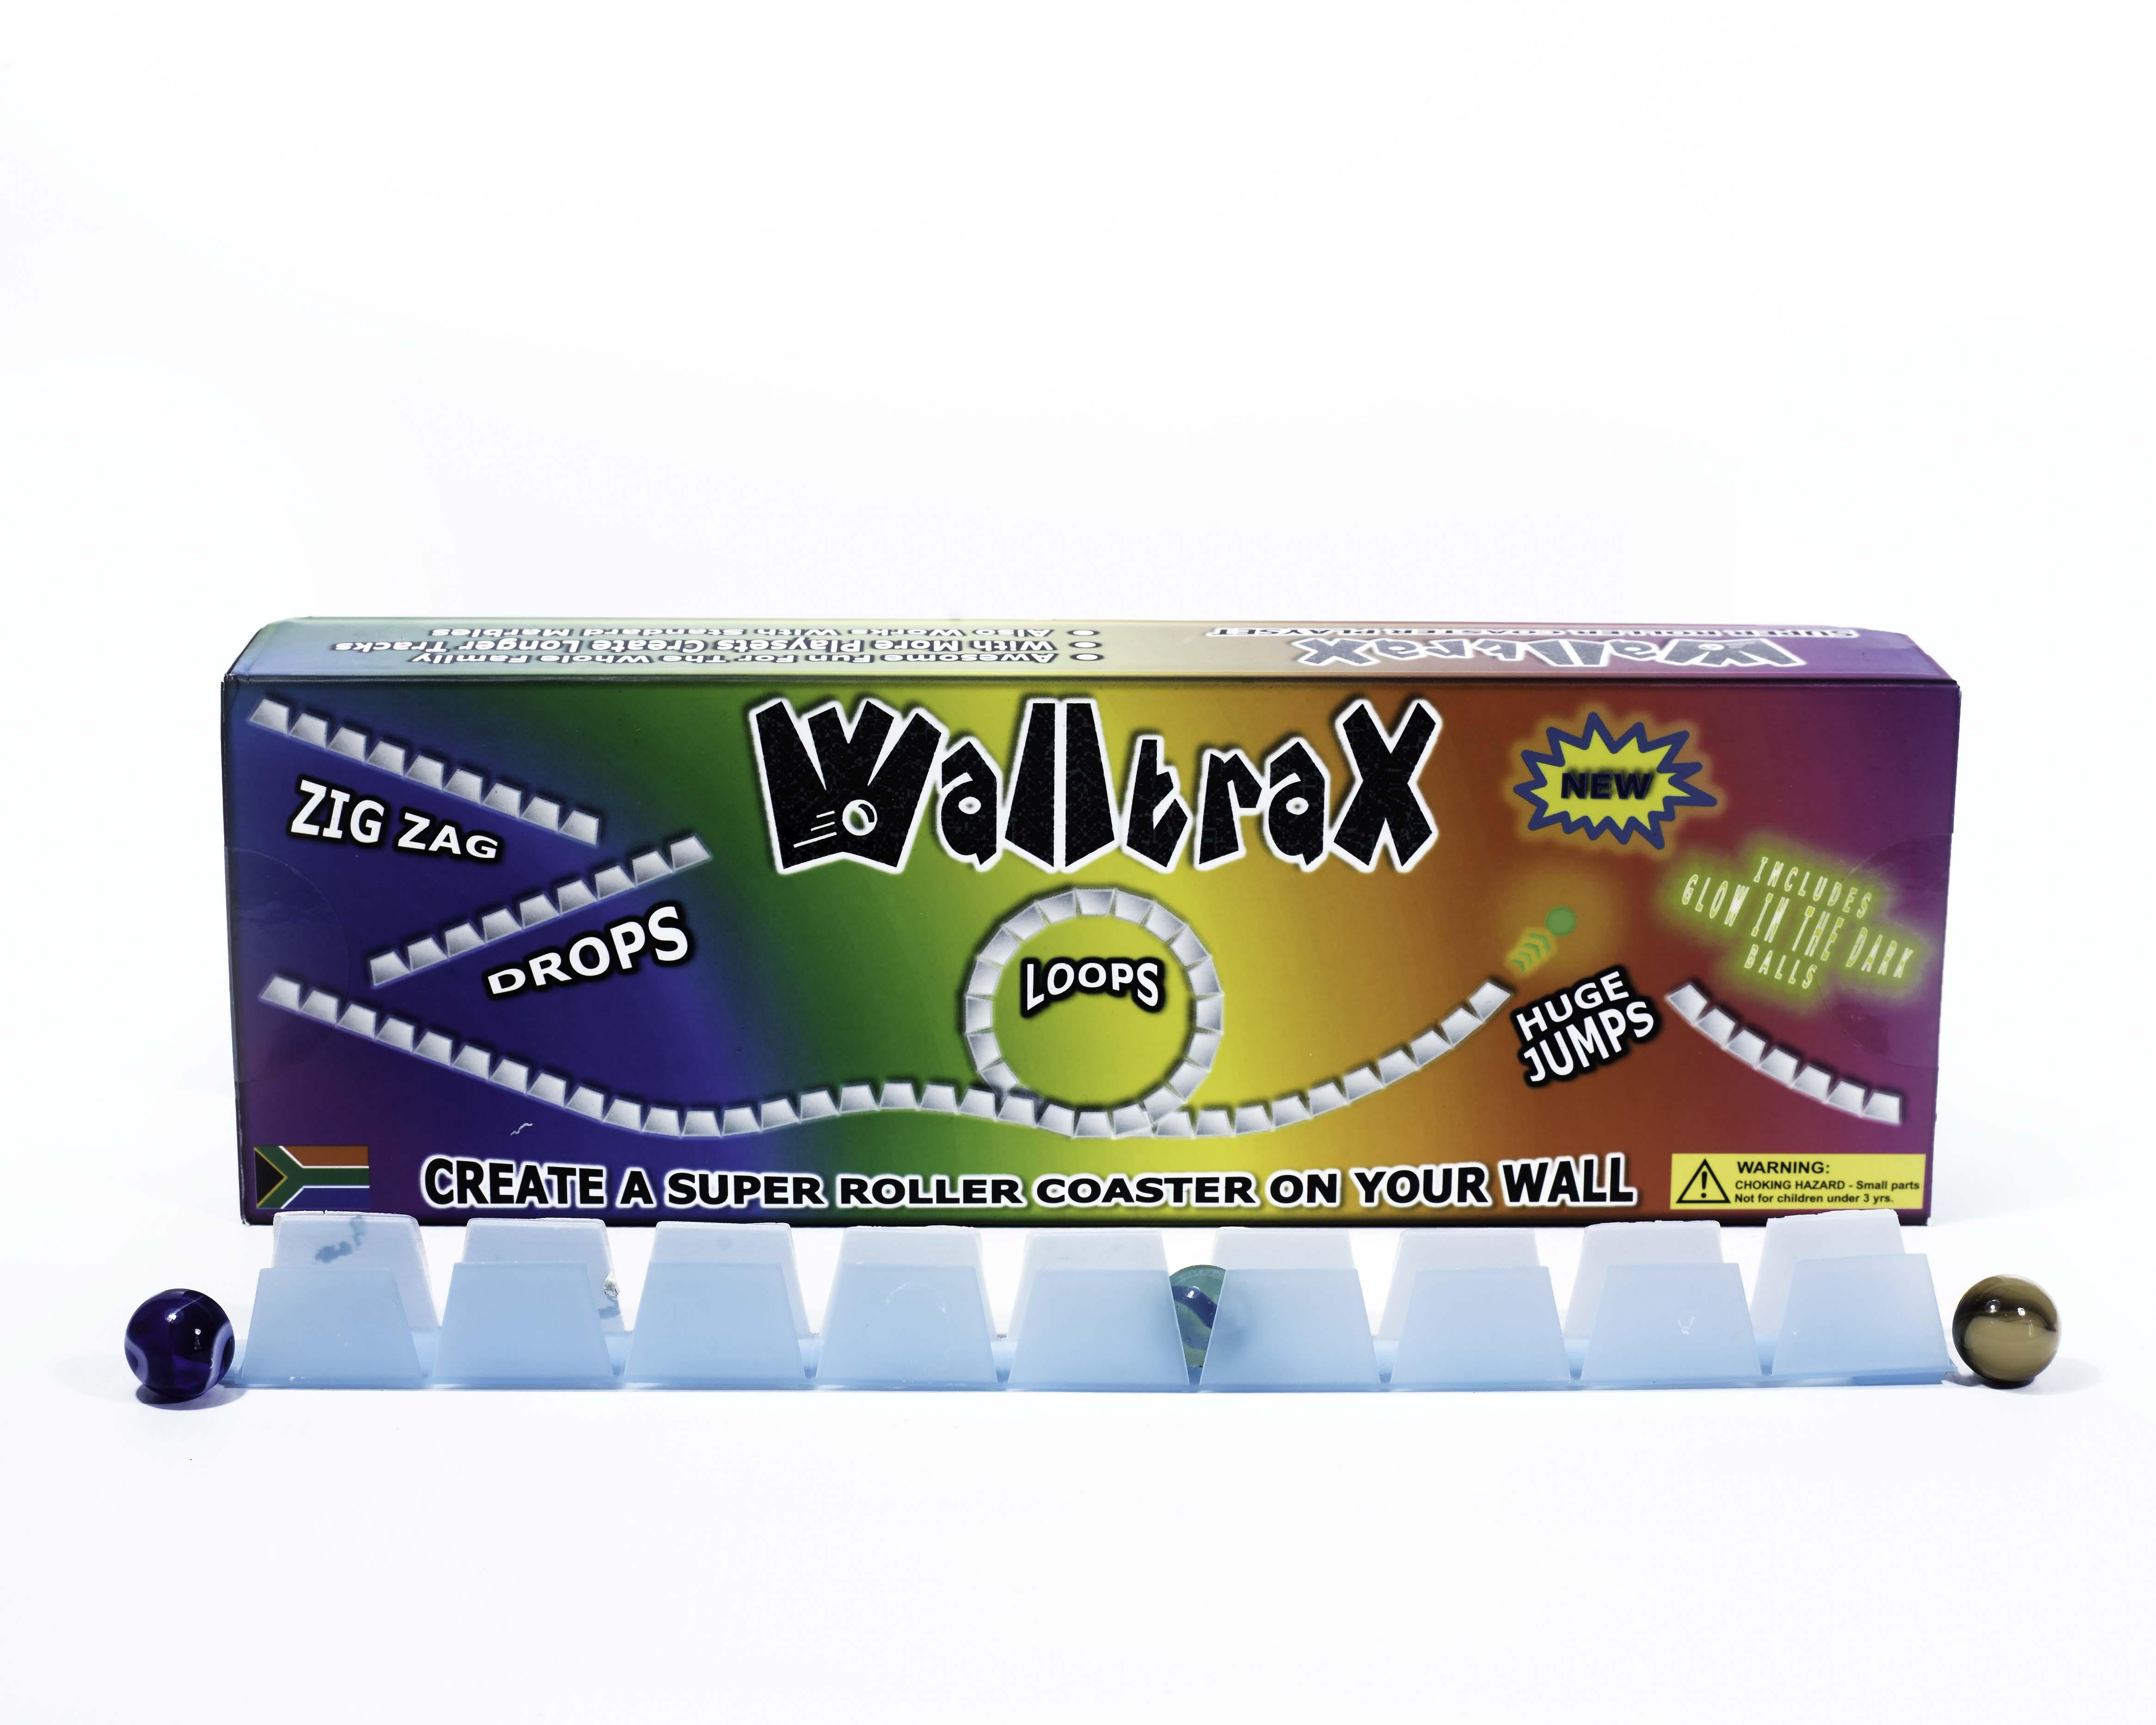 Walltrax - Marble run